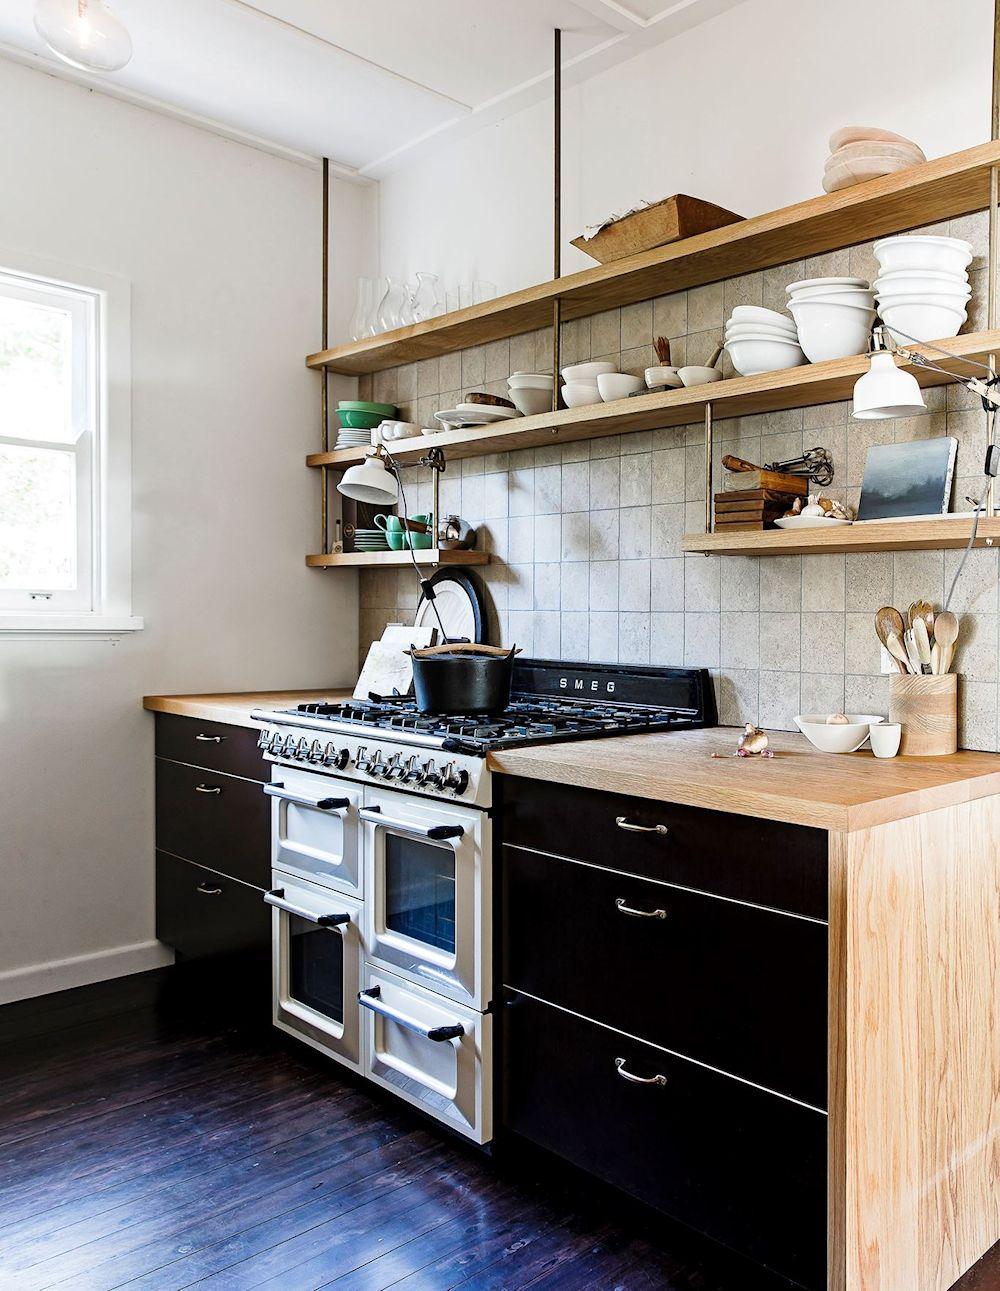 10 dise os de cocinas que incorporan madera a la decoraci n for Muebles de madera para cocina pequena